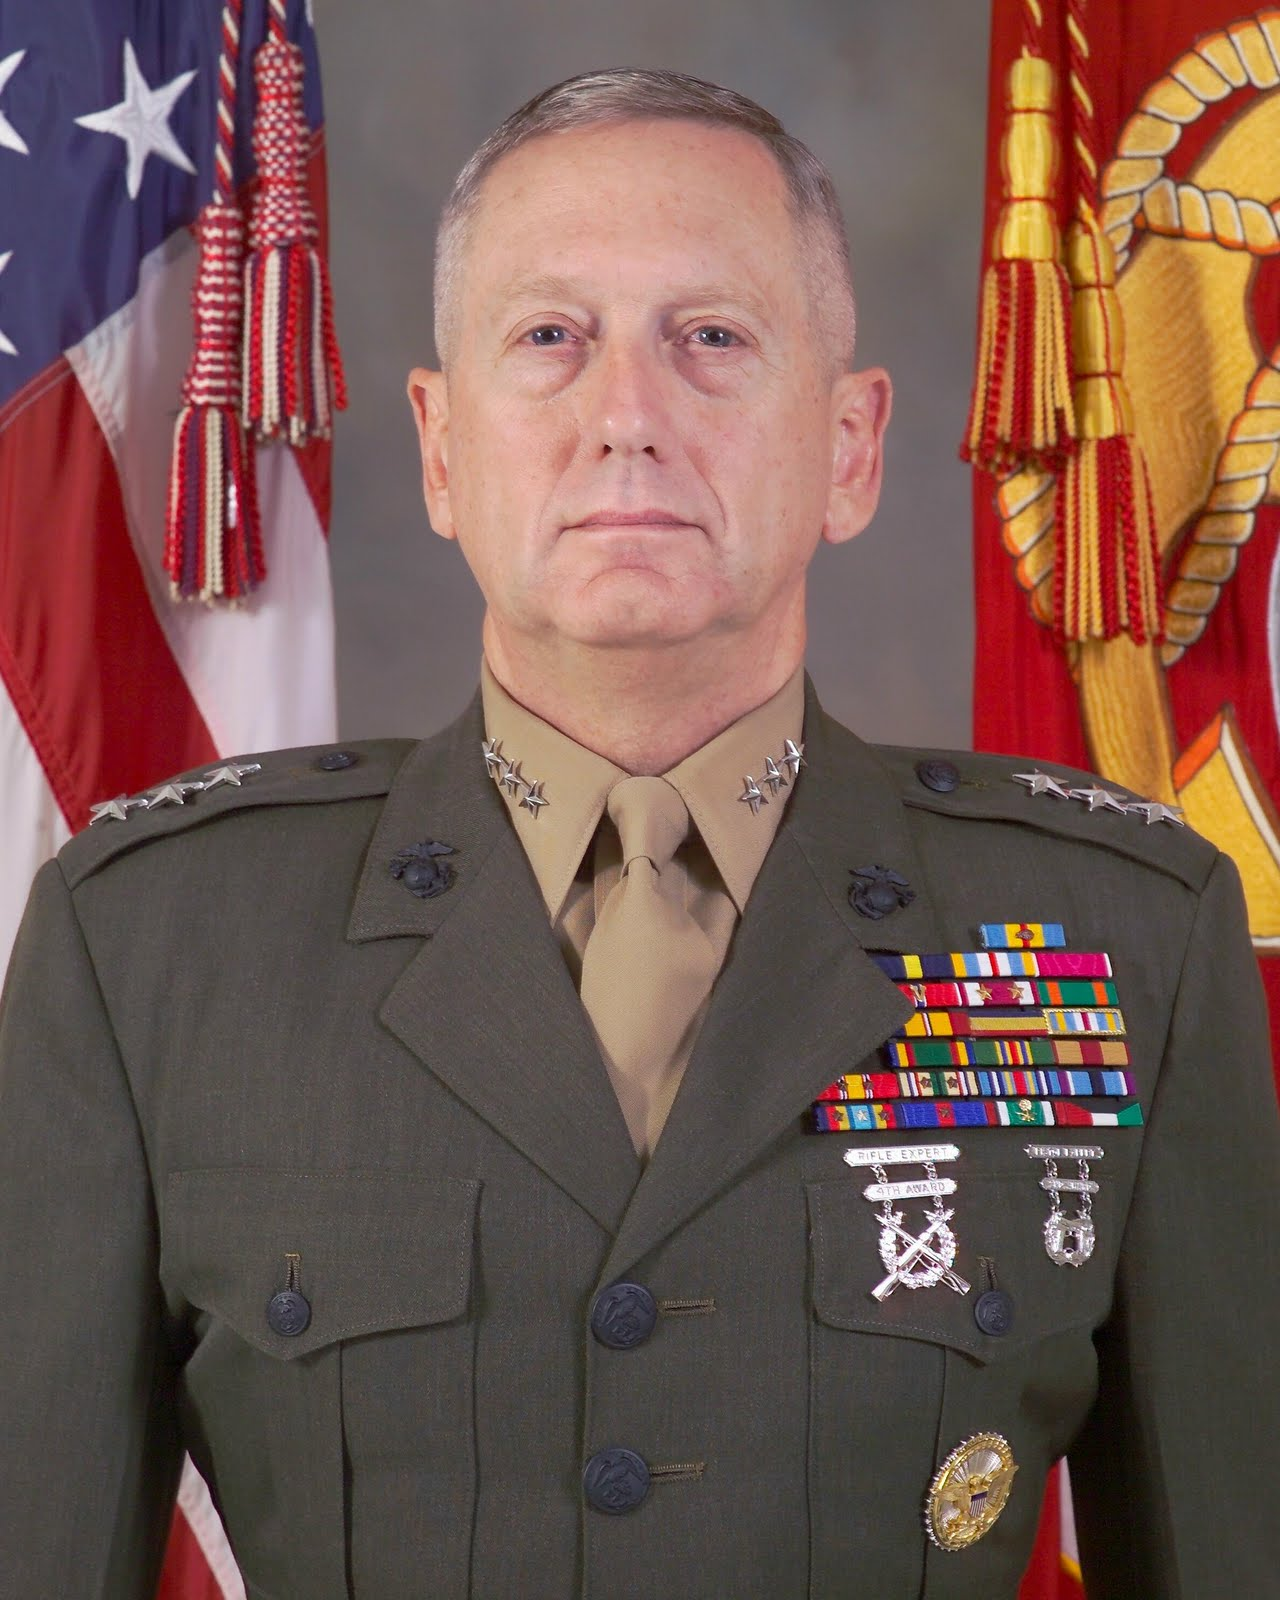 Marine corps dress uniform